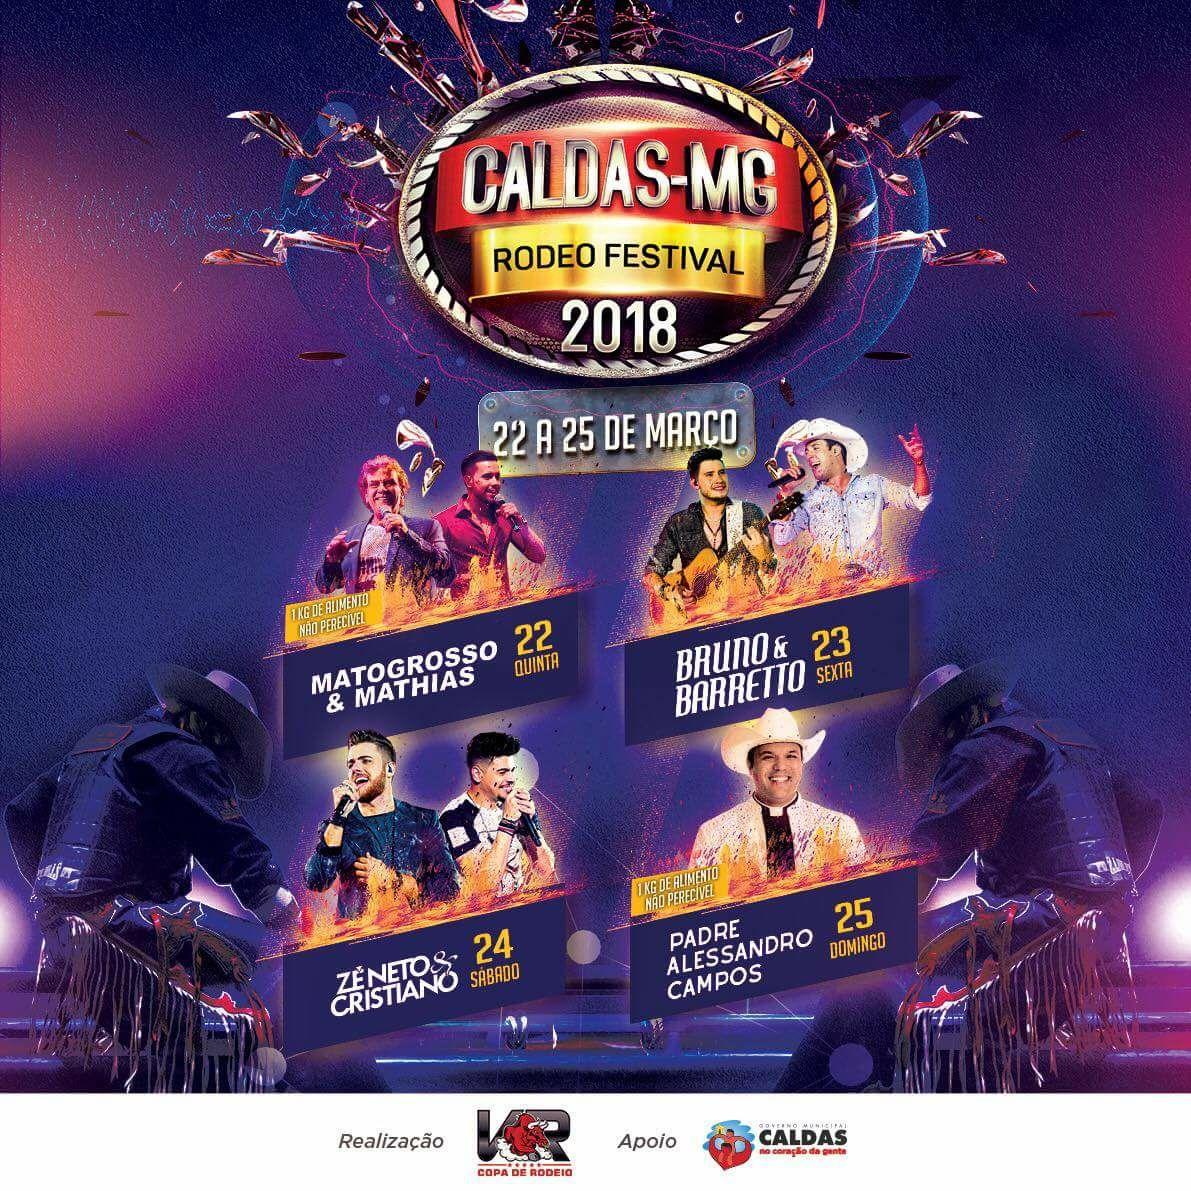 Circuito Rodeio 2018 : Caldas rodeo festival guia de rodeios brasil